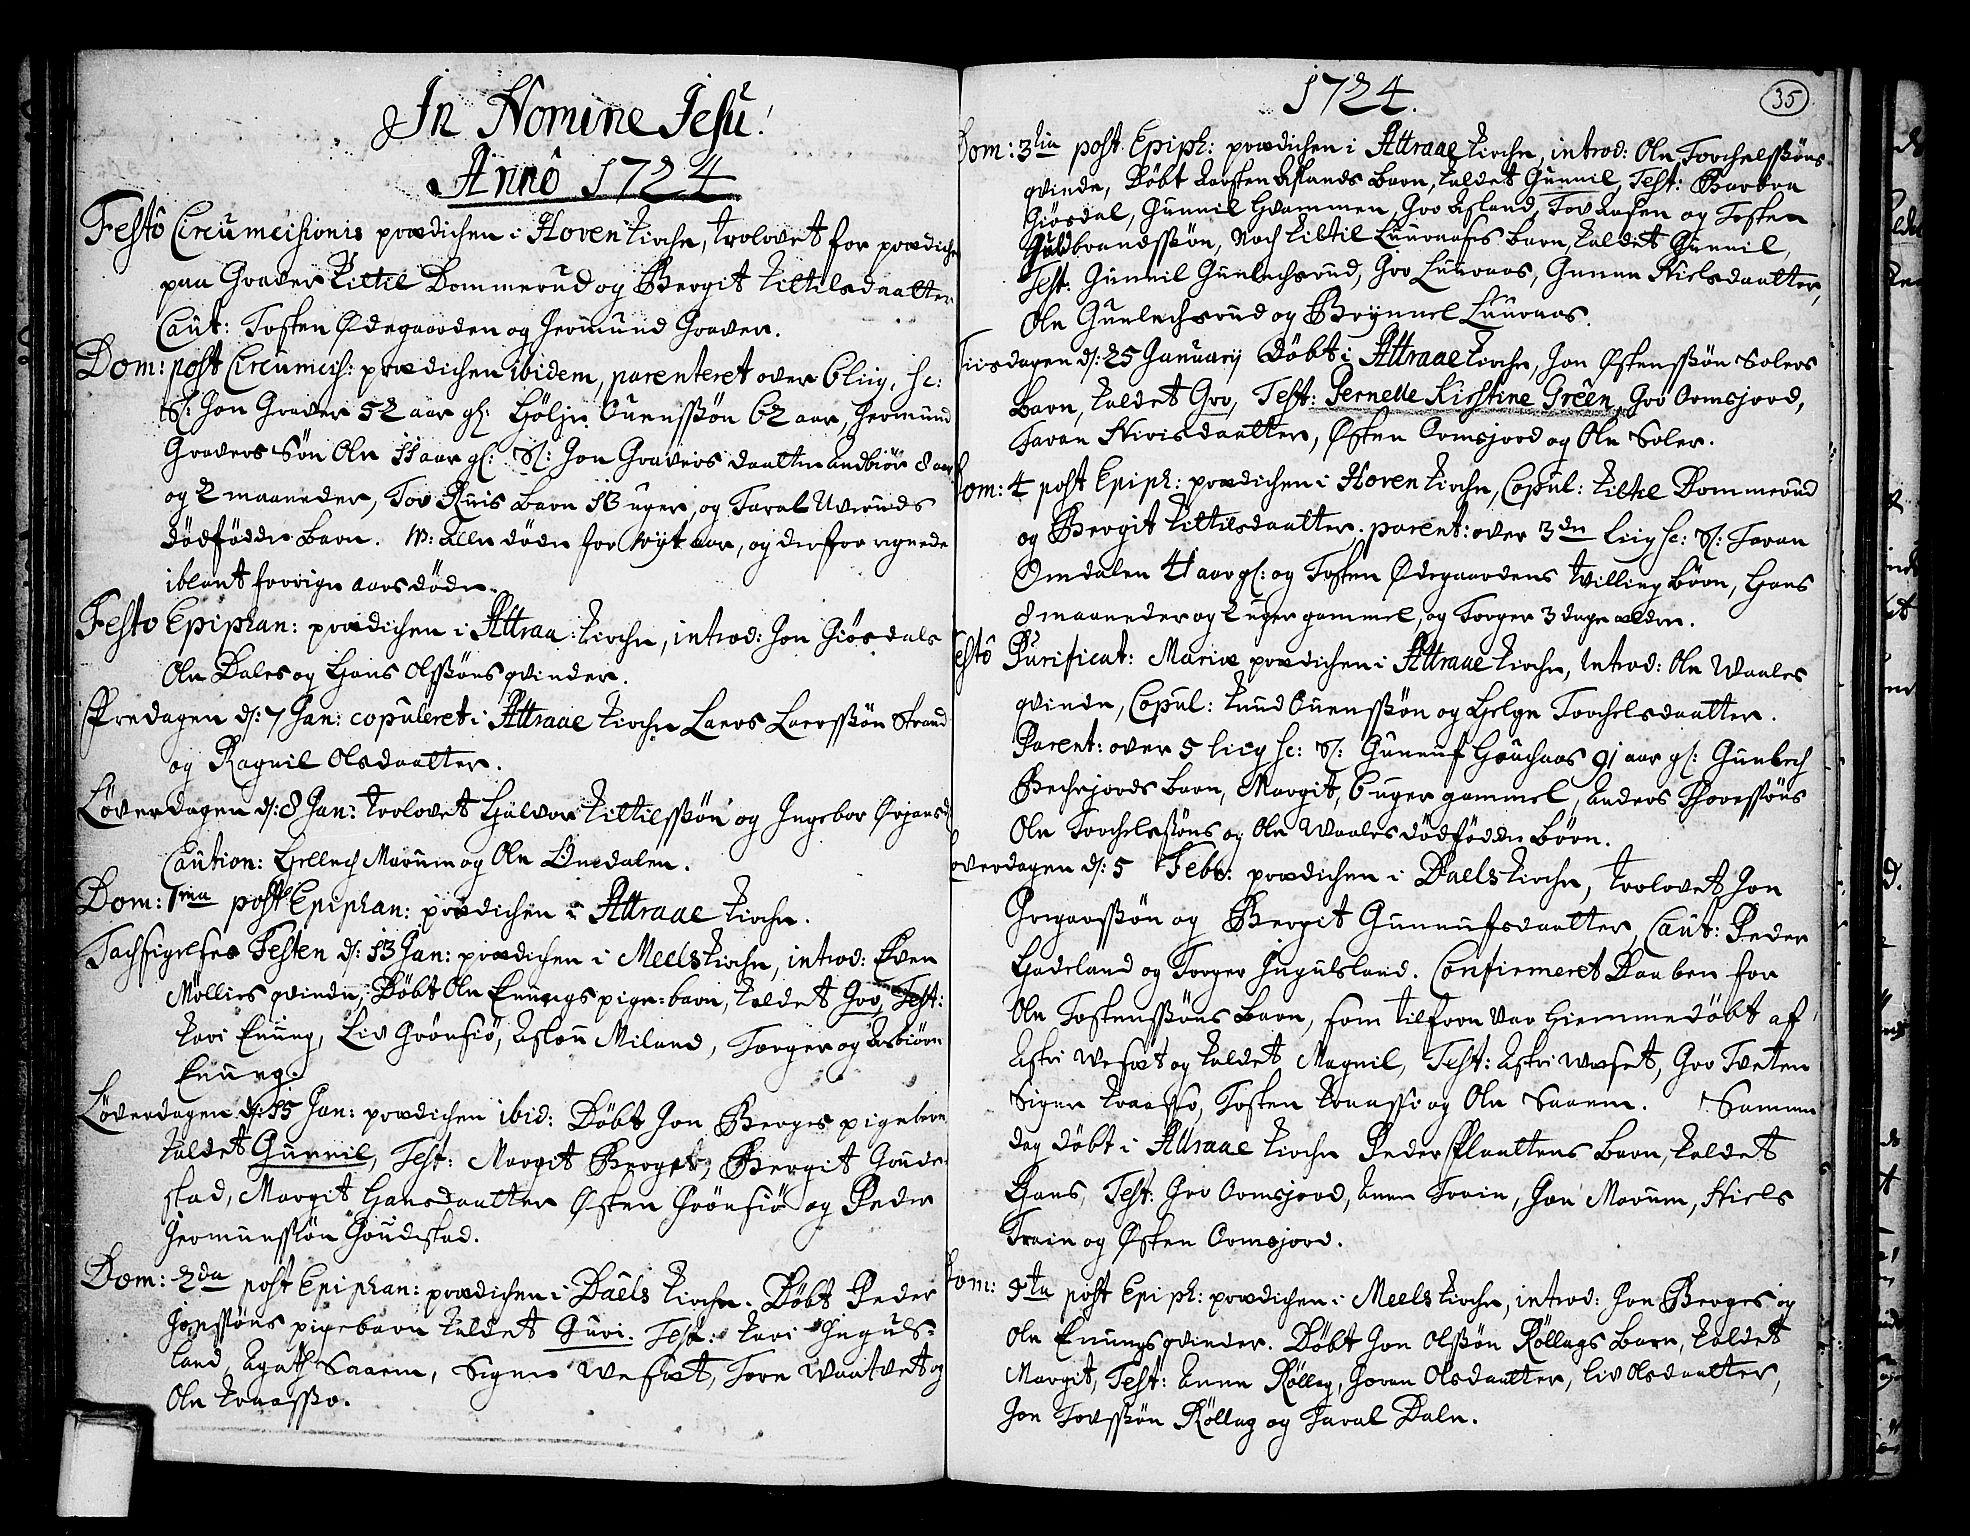 SAKO, Tinn kirkebøker, F/Fa/L0001: Ministerialbok nr. I 1, 1717-1734, s. 35